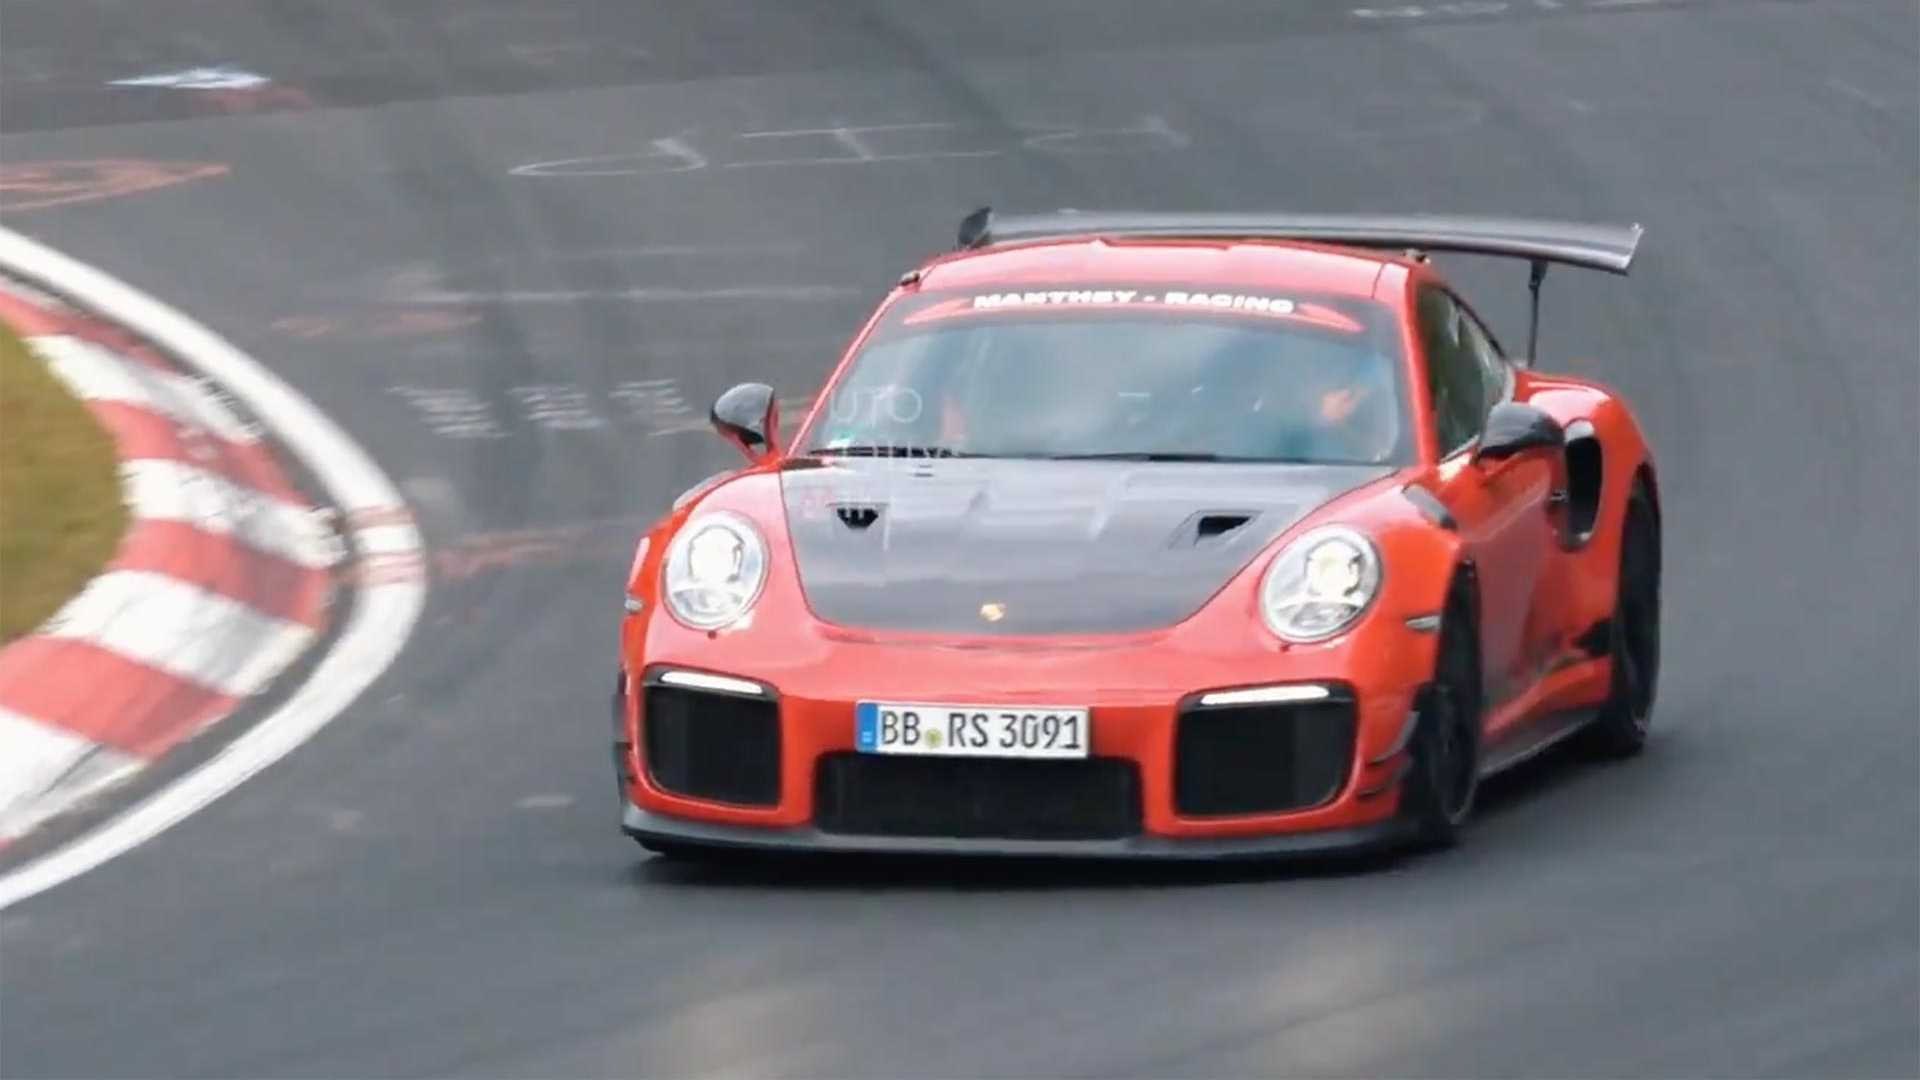 Porsche 911 Gt2 Rs Mr Spied During Return To Nurburgring